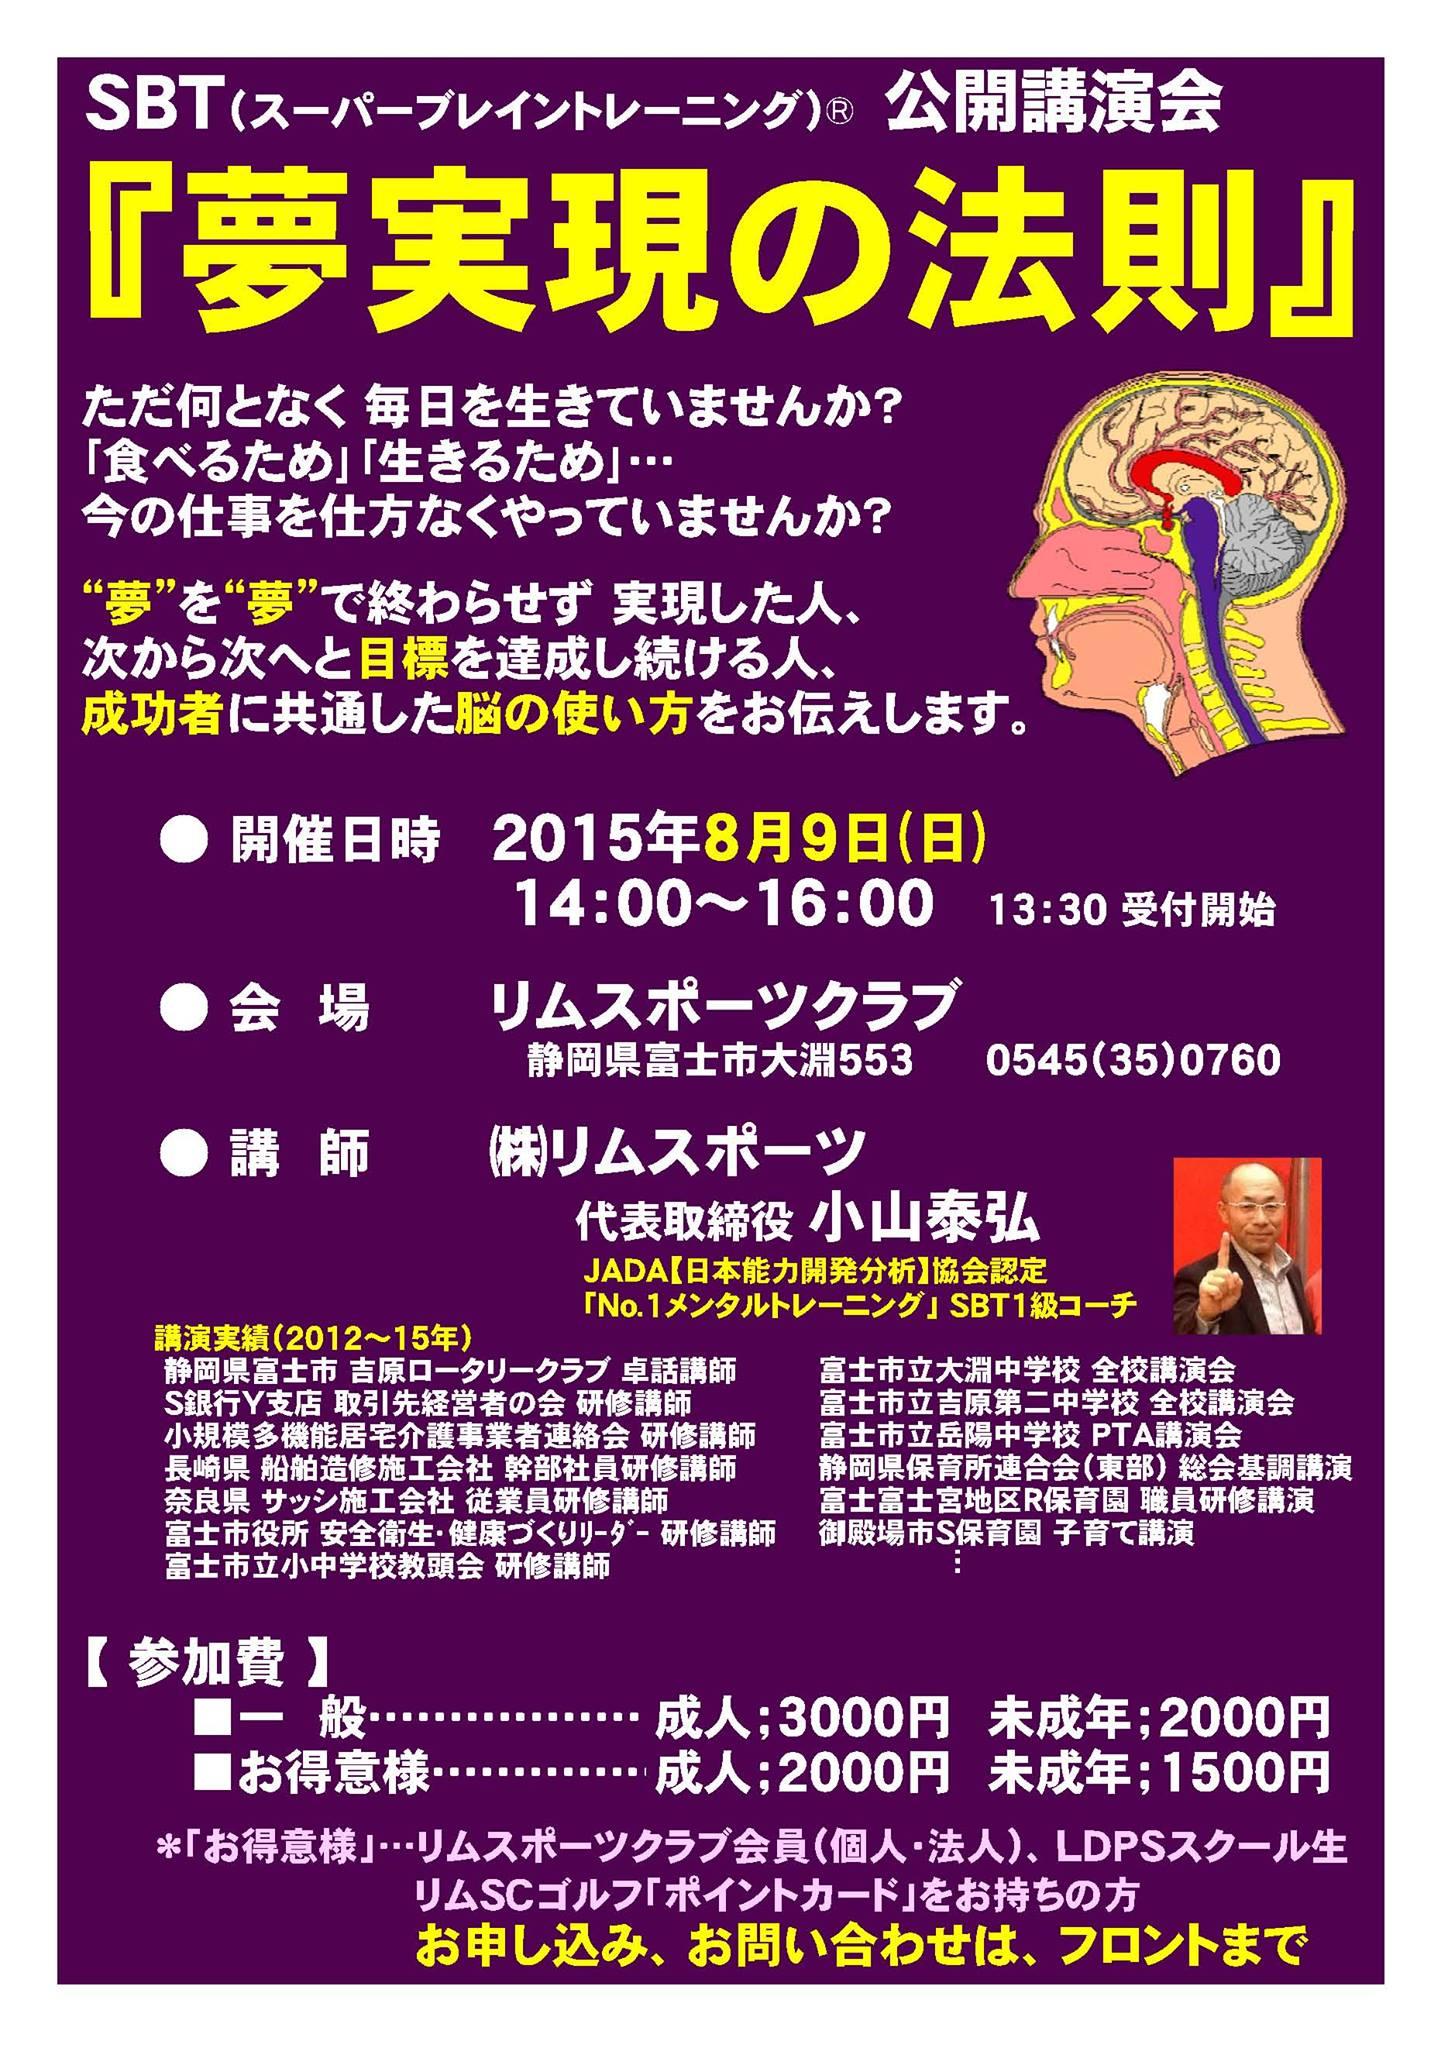 「No.1メンタルトレーニング」SBT公開講演会 『夢実現の法則』開催日時 :2015年8月9日 14~16時